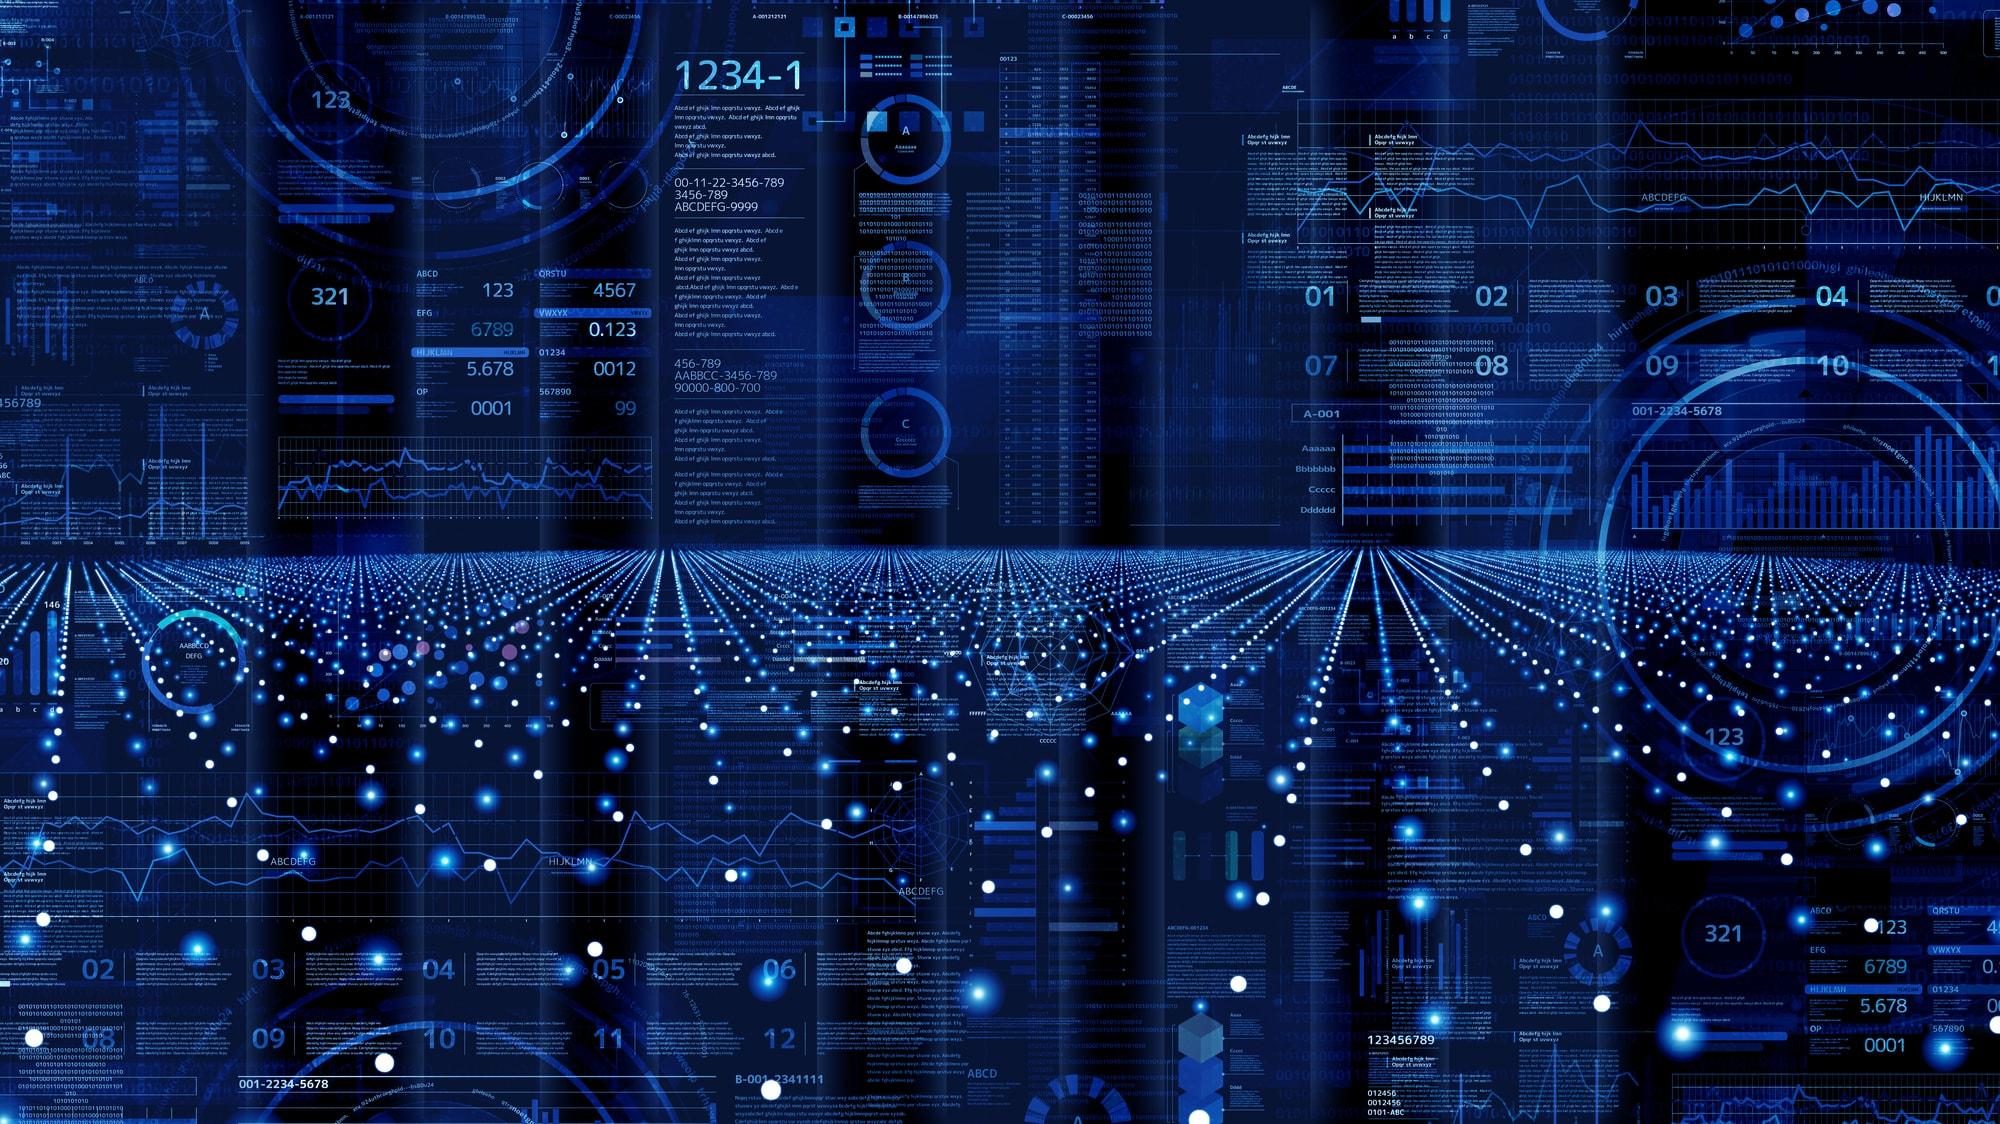 SD-WANの技術的要件とは?7つの機能と仕組みについて解説!